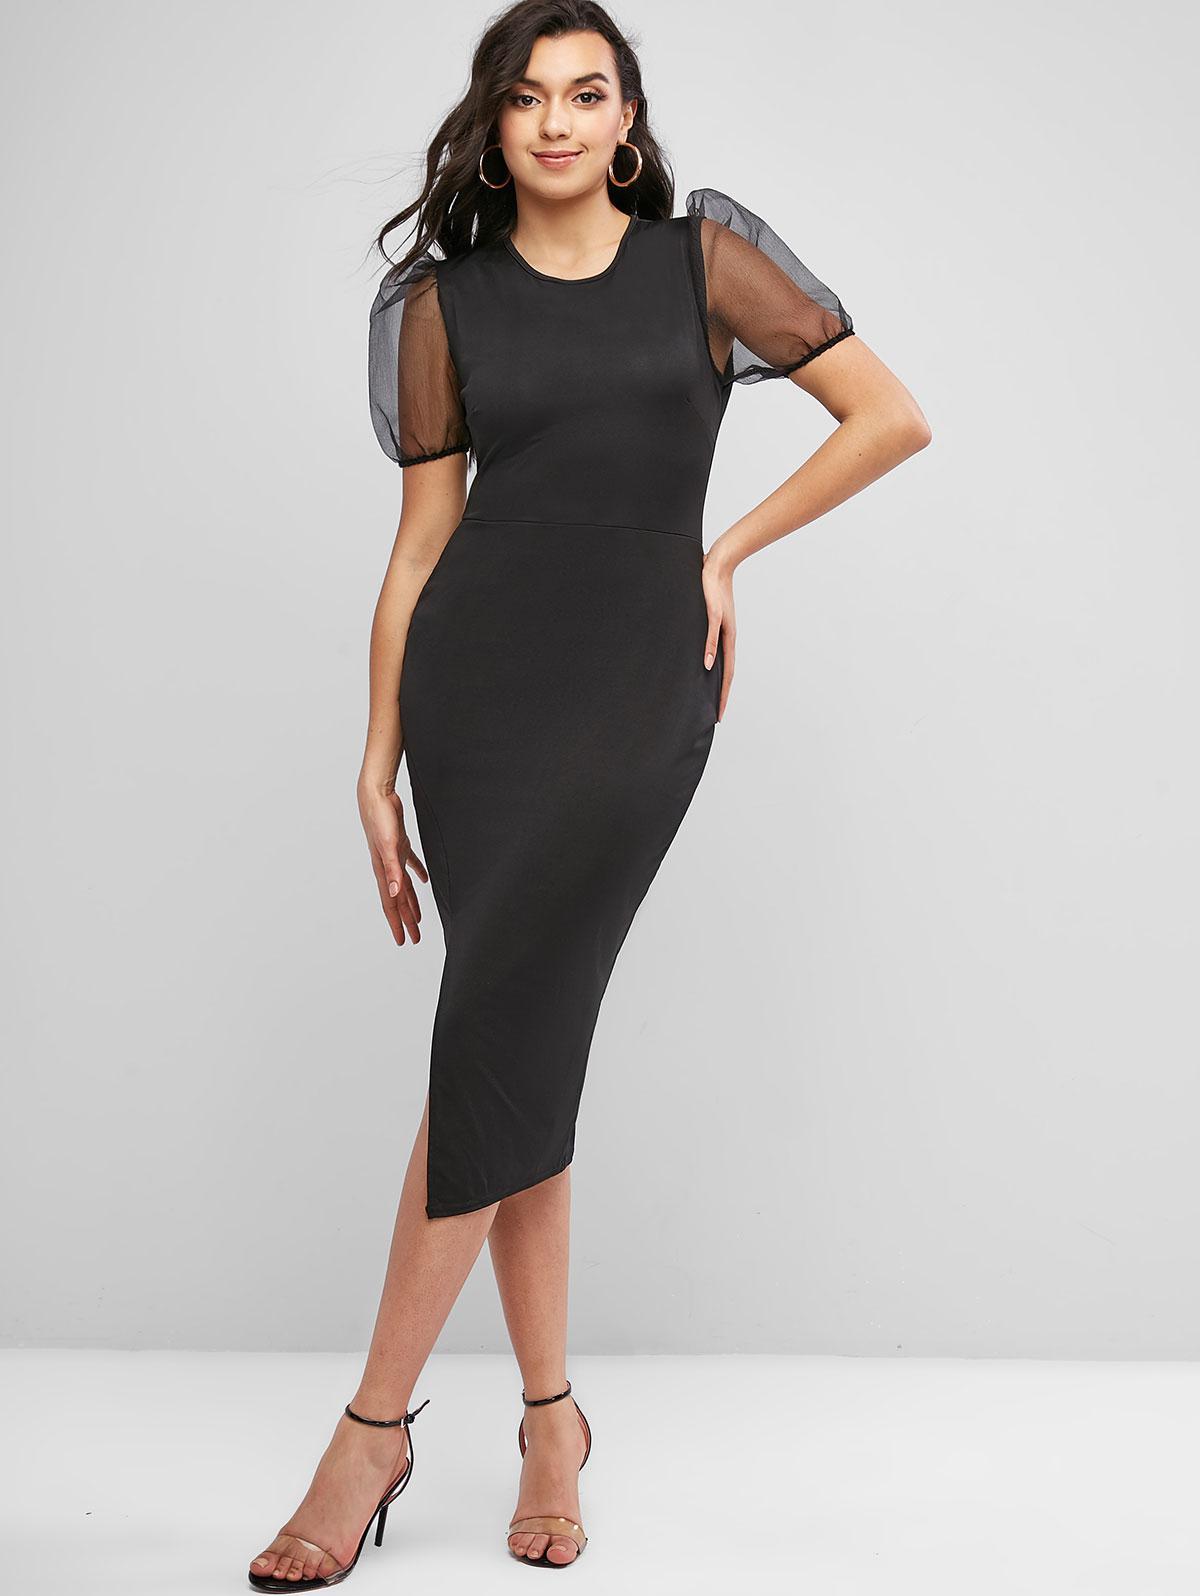 Sheer Puff Sleeve Bodycon Slit Dress